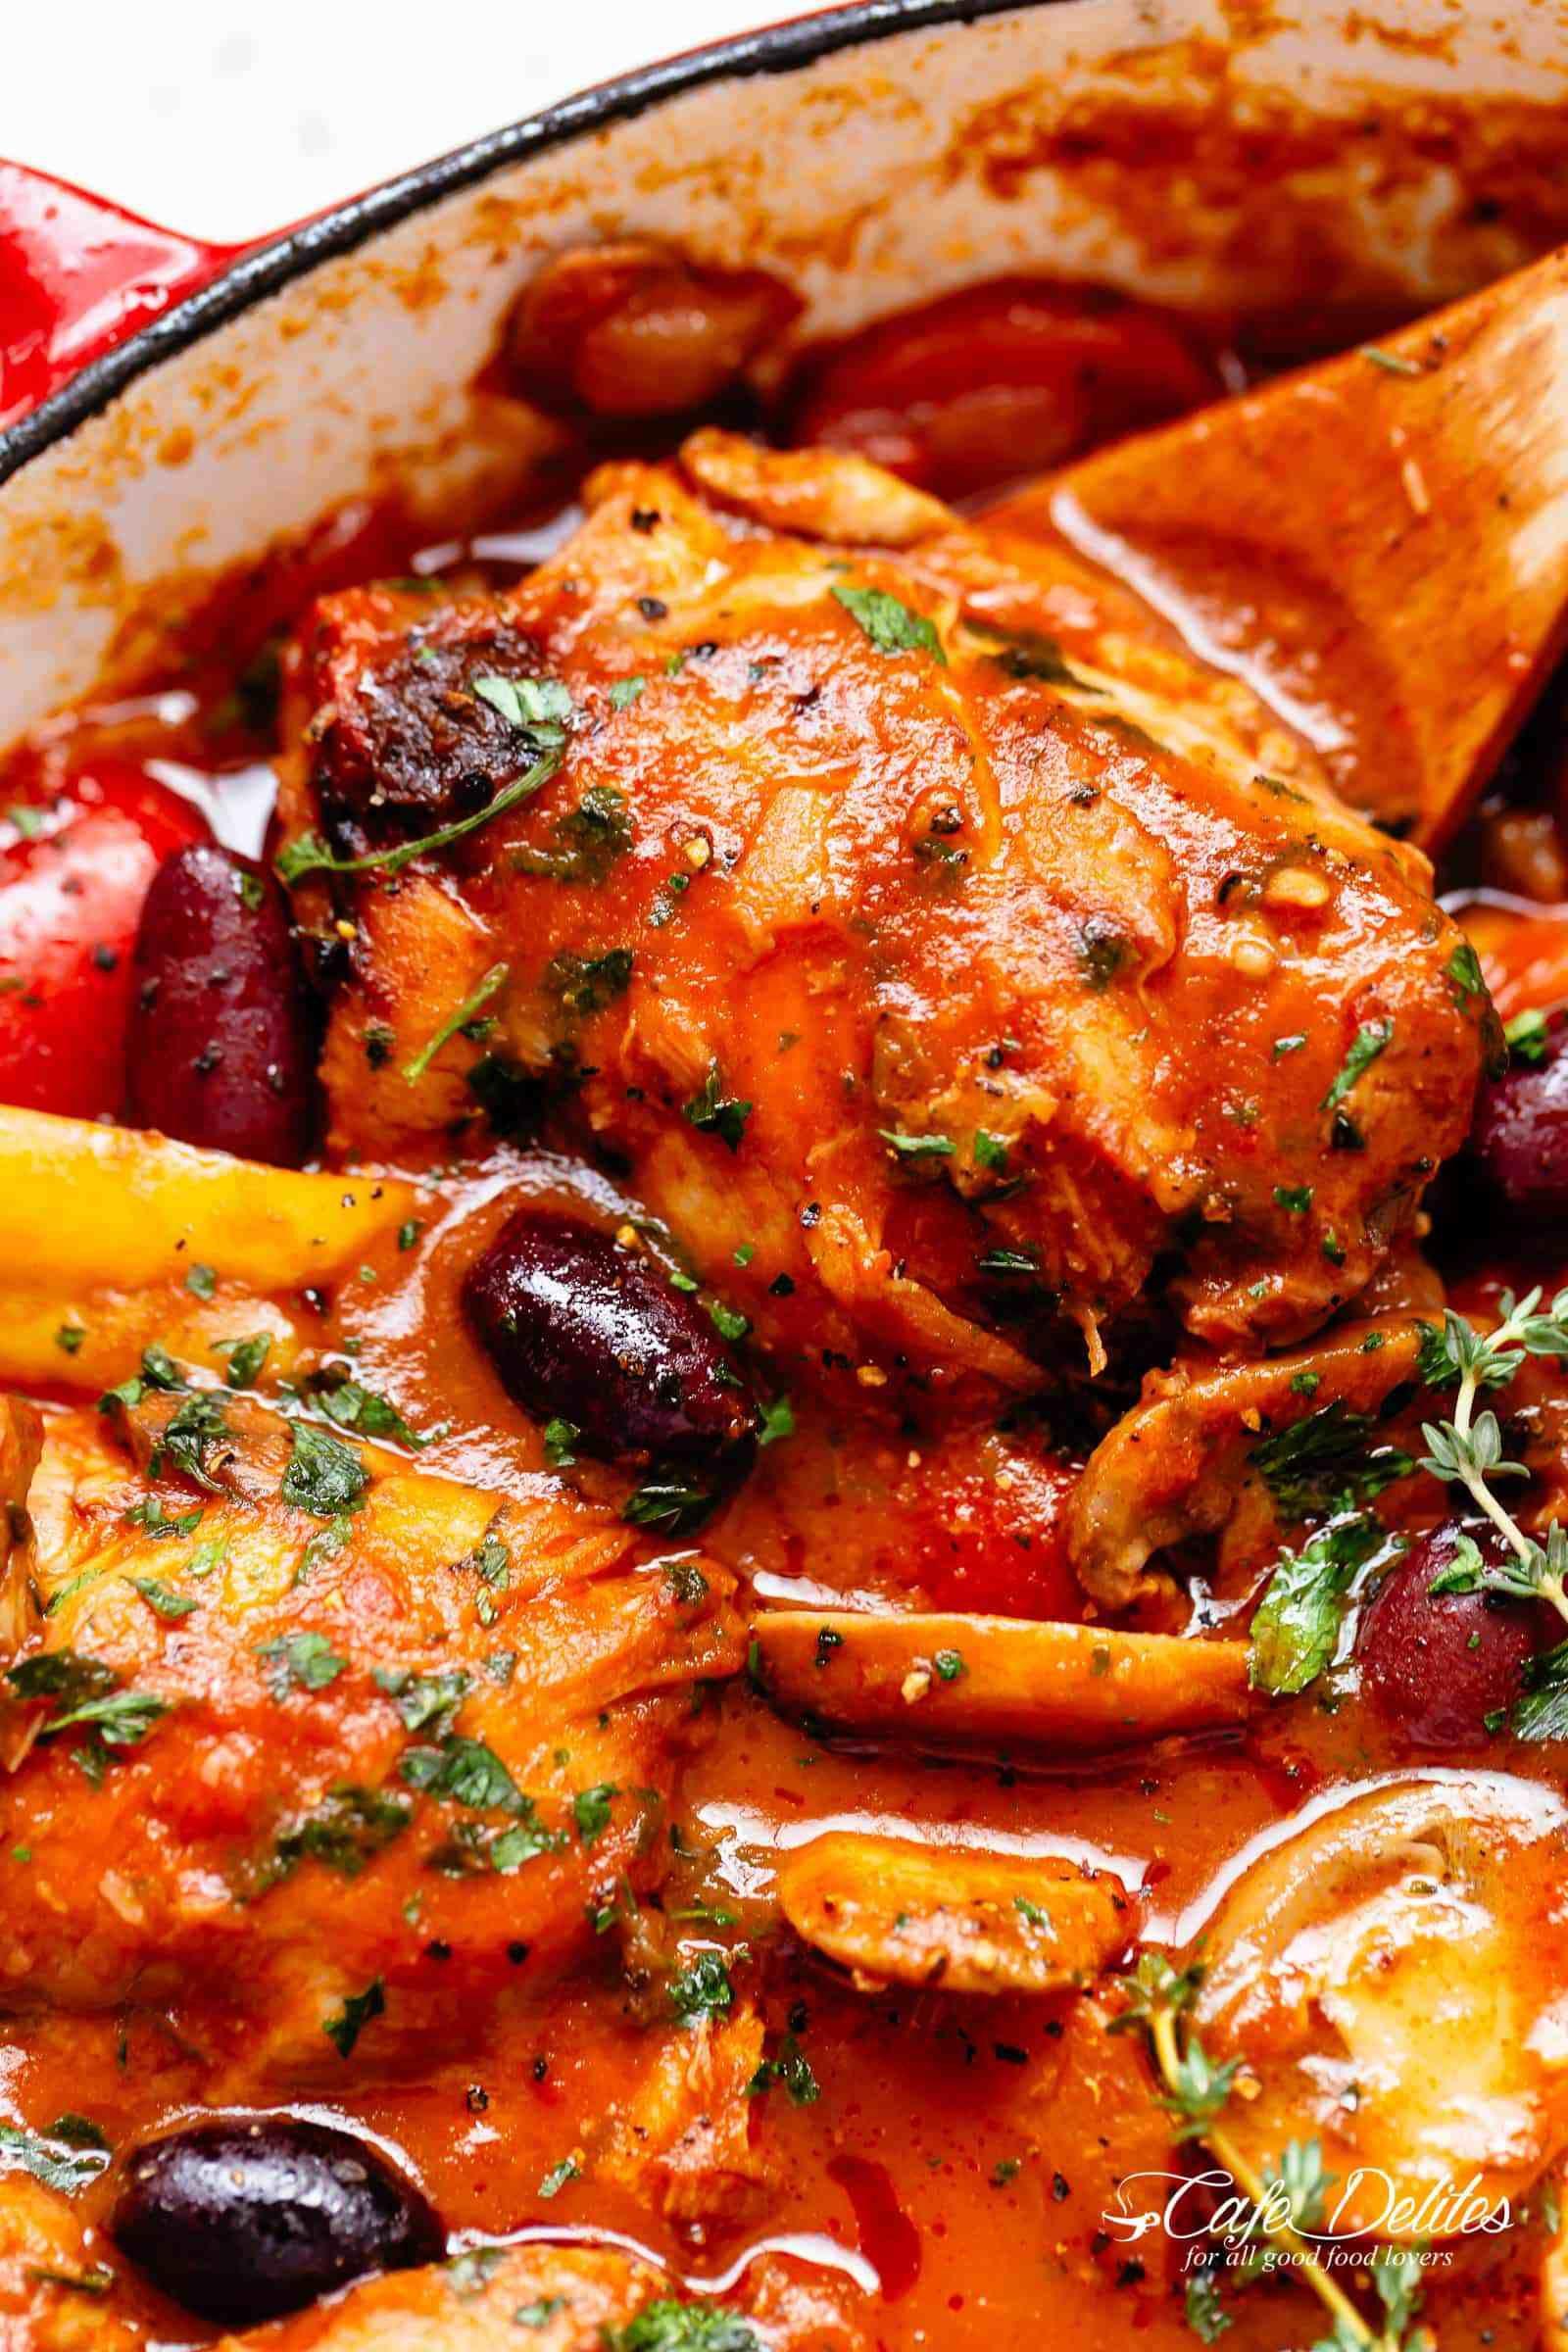 The Best Chicken Cacciatore Recipe Is Easy To Make Cafedelites Com Cacciatore Recipes Chicken Cacciatore Recipe Italian Comfort Food